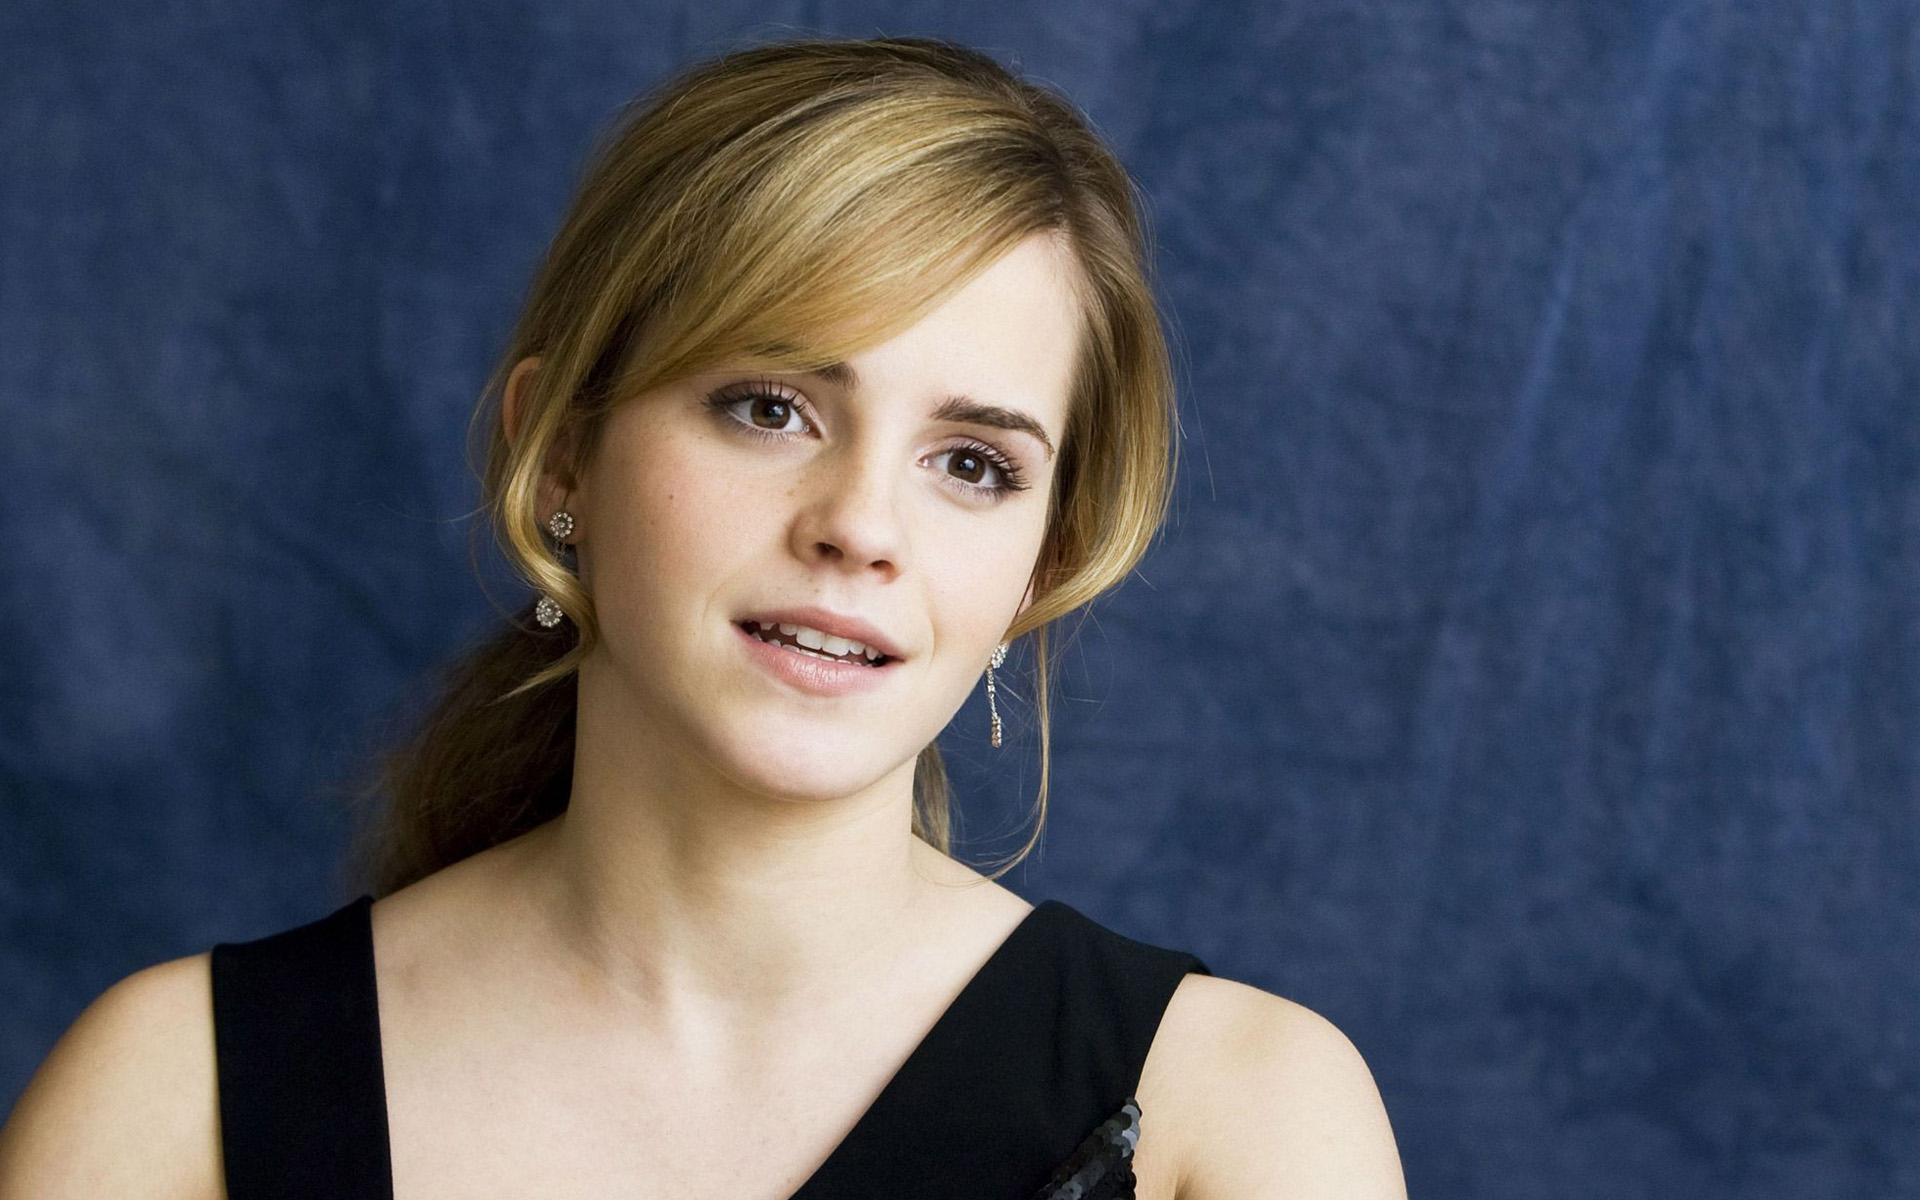 Emma Watson HD Wallpaper | Background Image | 1920x1200 | ID:82515 - Wallpaper Abyss